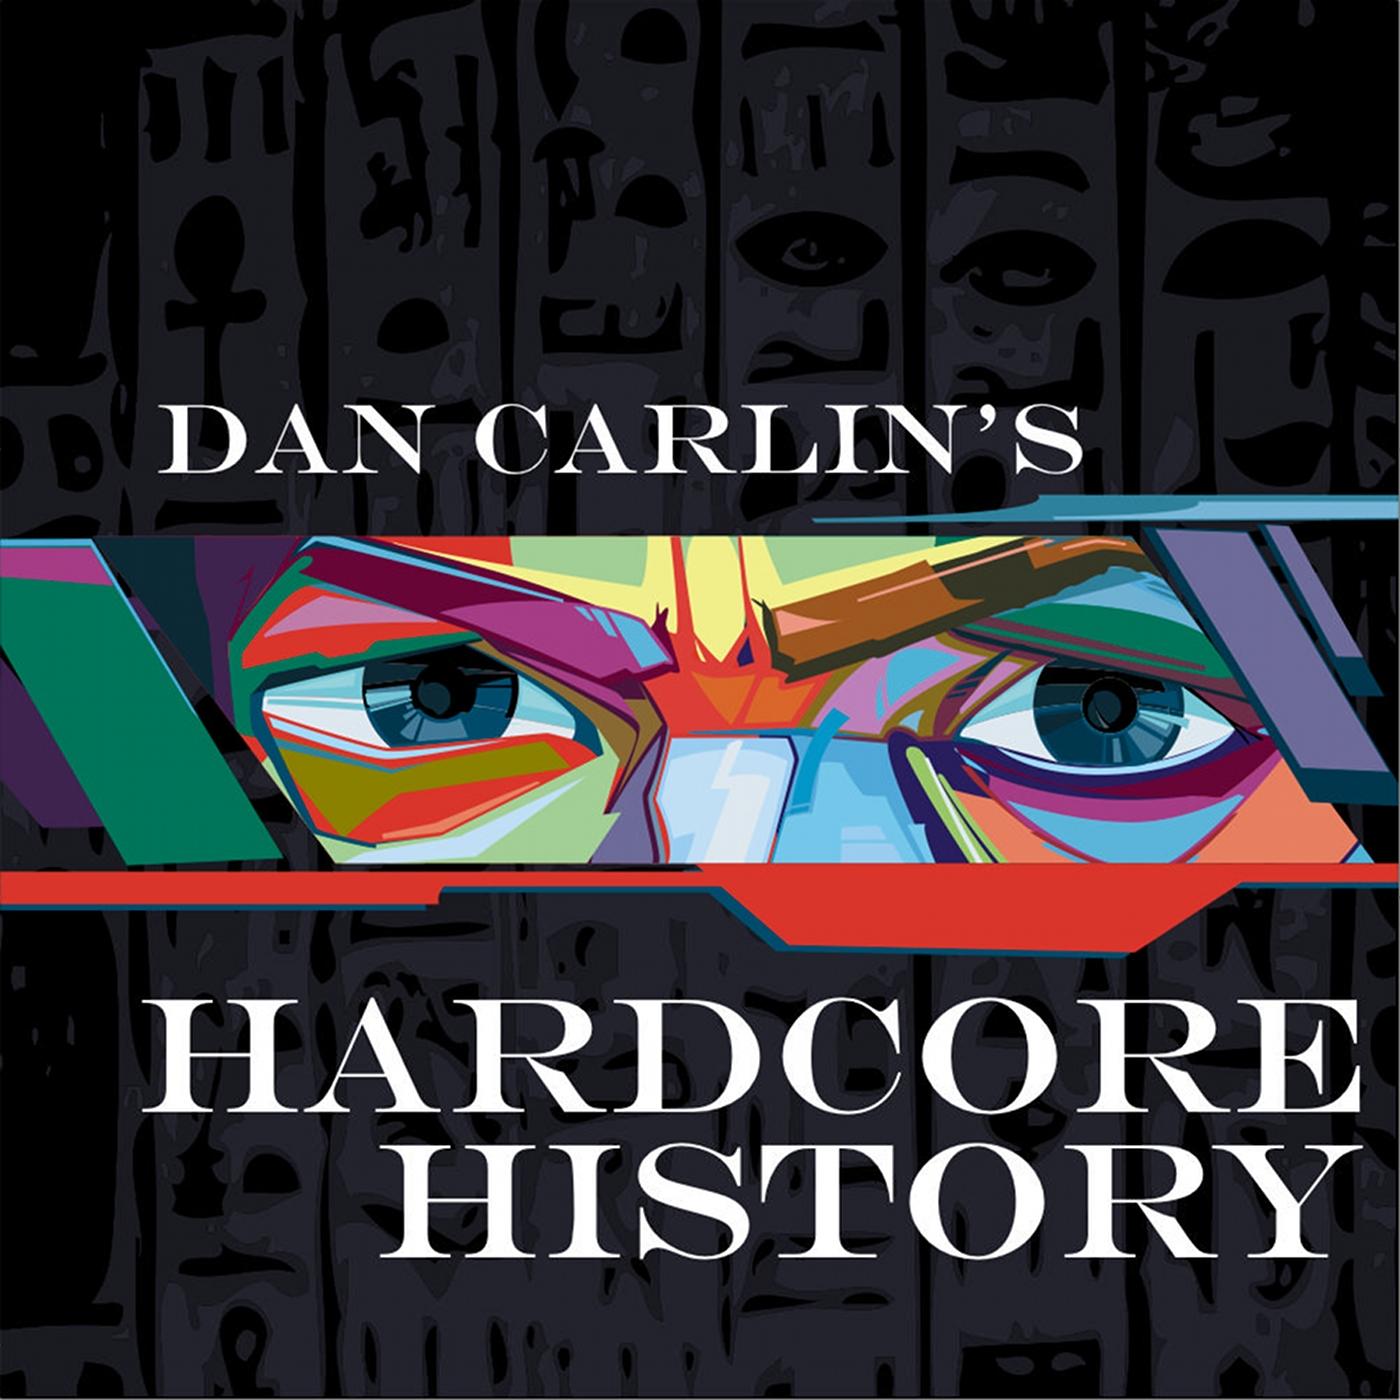 Image result for Dan carlin's hardcore history